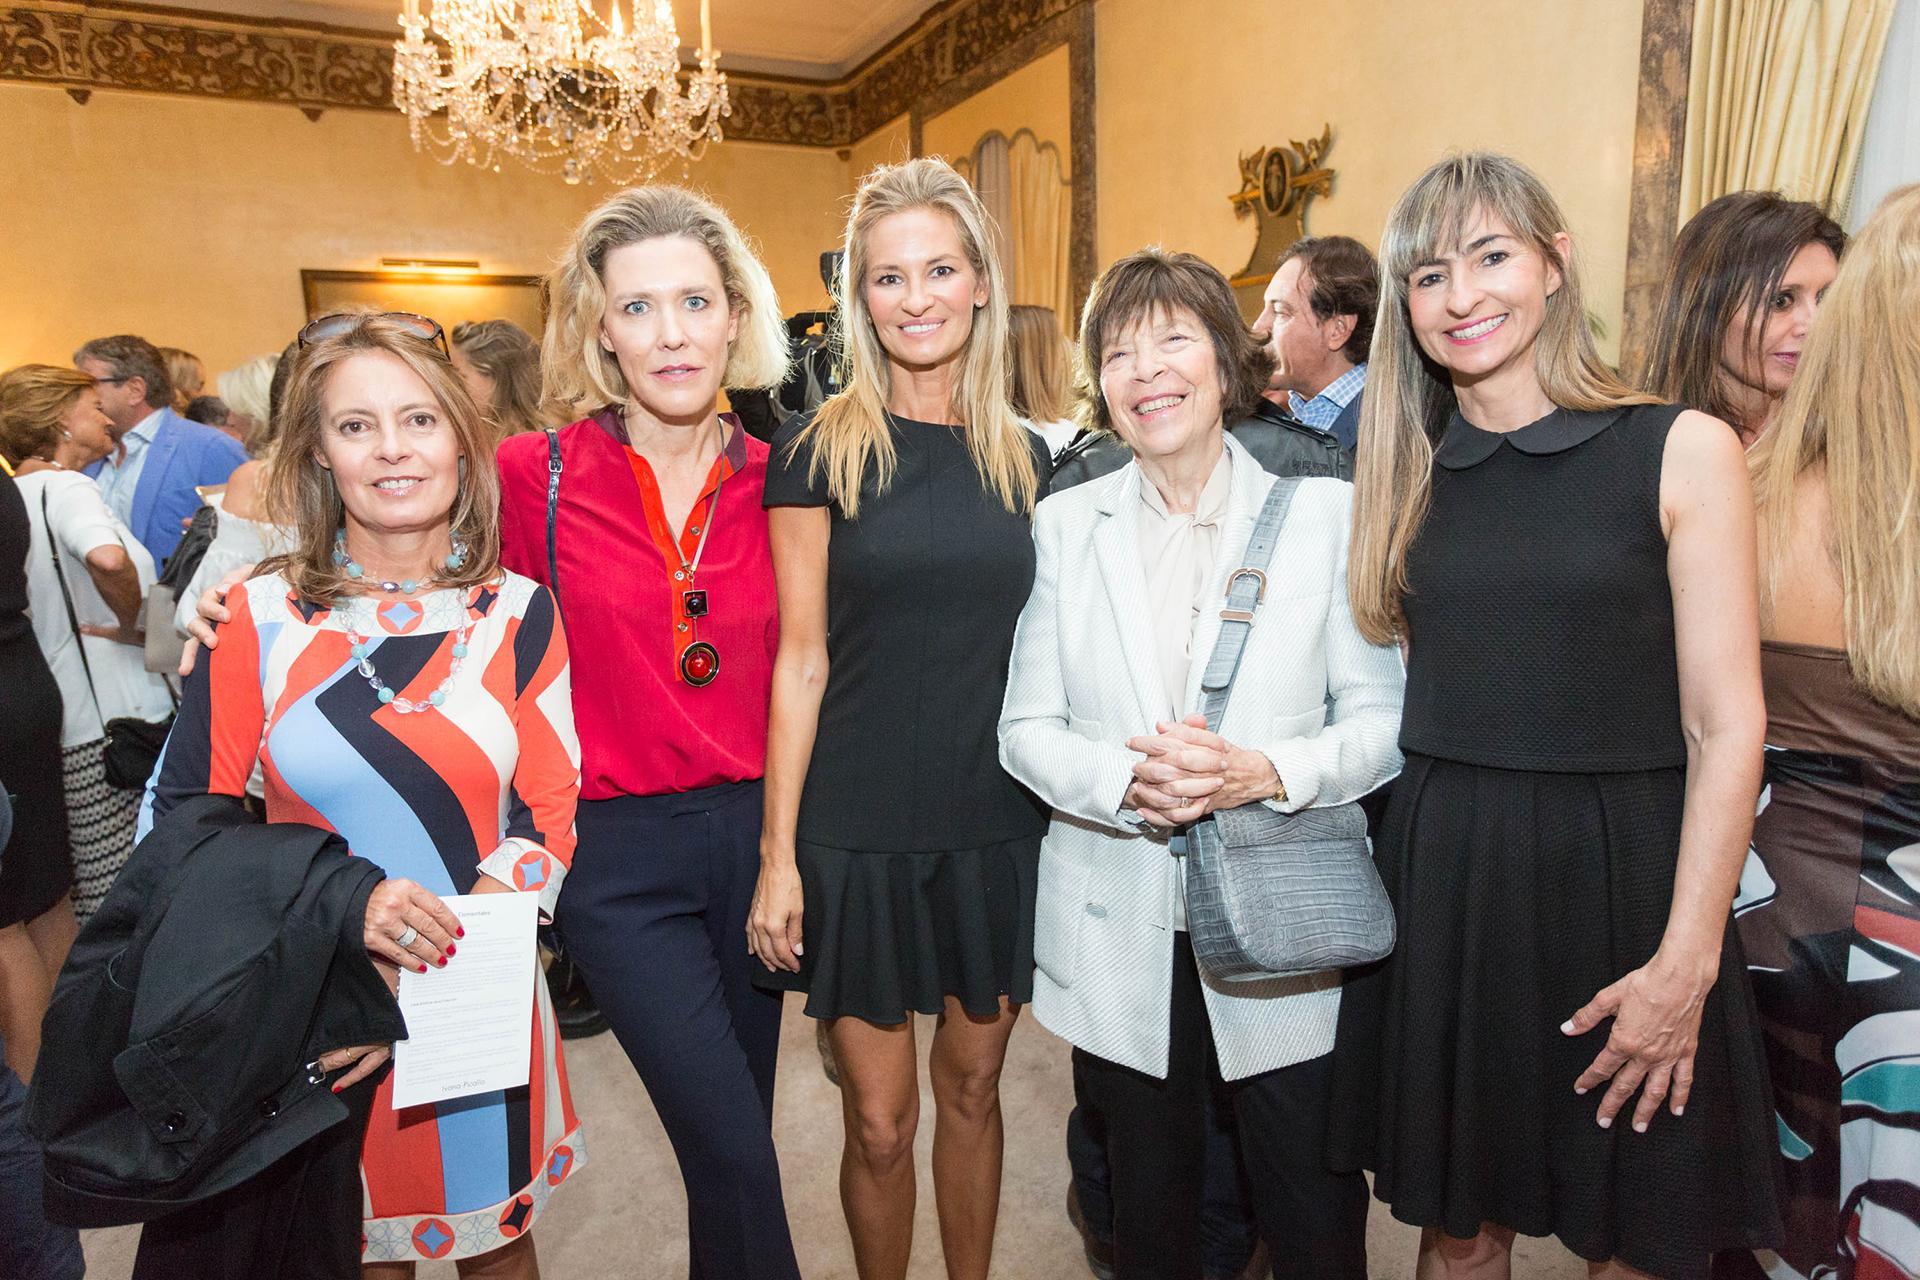 Rita de Achaval, Alexandra De Royere, Lily Sciorra de Mascardi, Silvia Gold de Sigman y Paula Botto